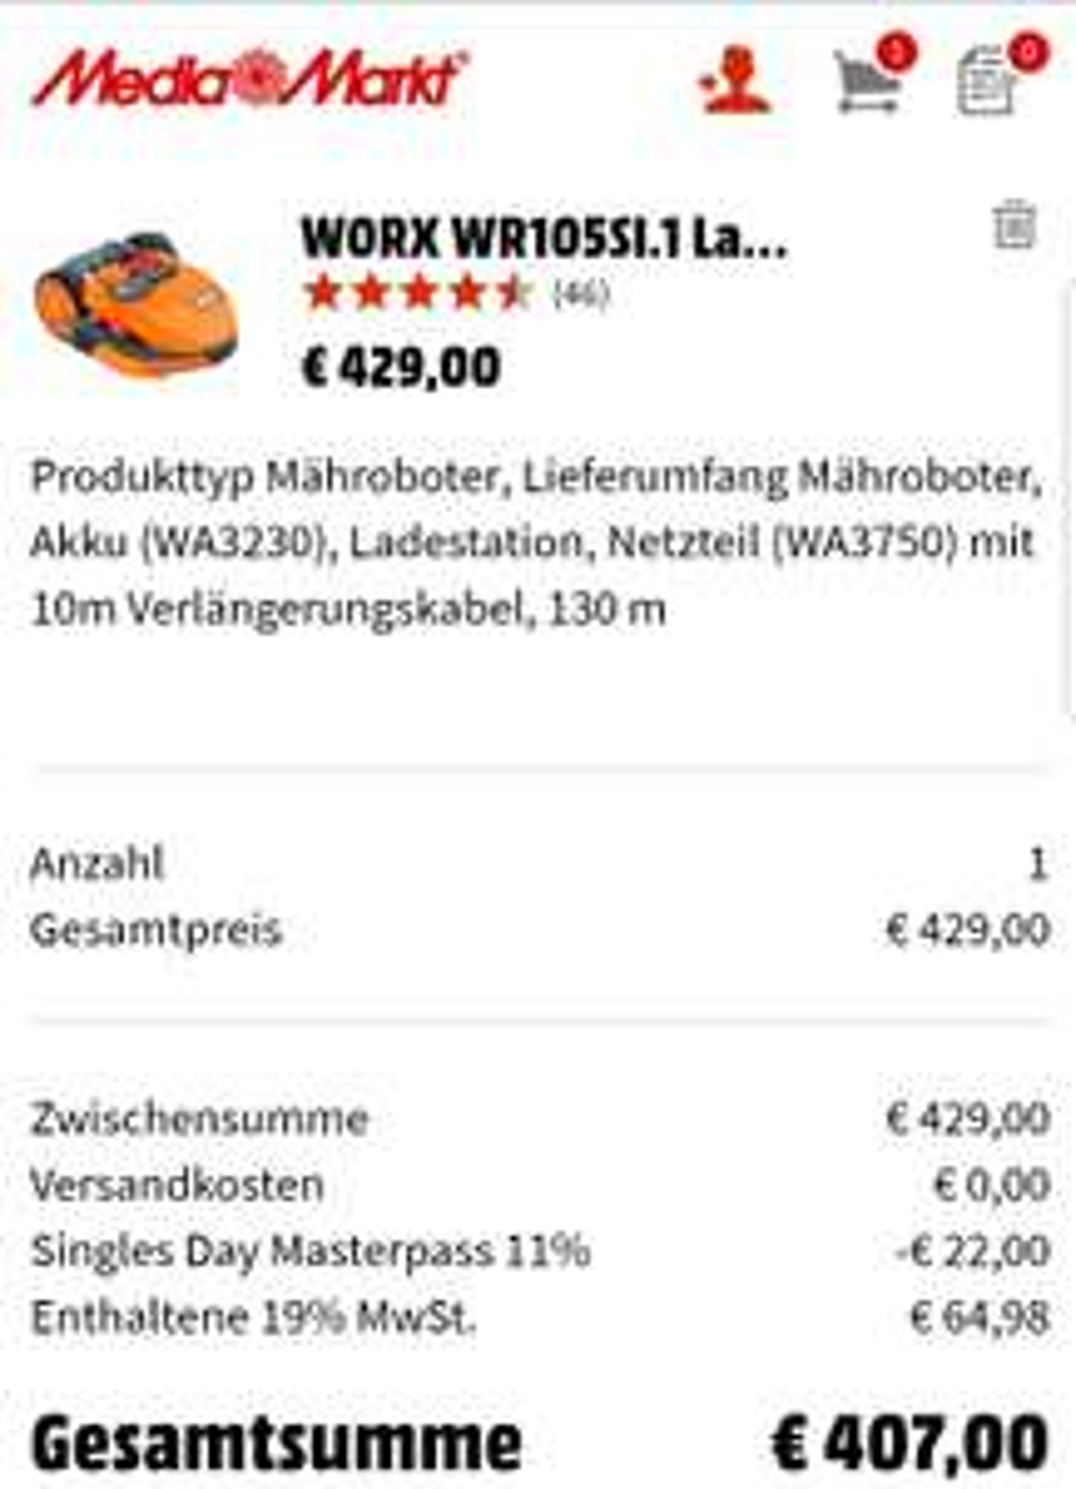 [Mediamarkt + Masterpass & Saturn/Ebay] WORX S500I Landroid, Mähroboter, 500 M², App-steuerbar, WR105SI.1